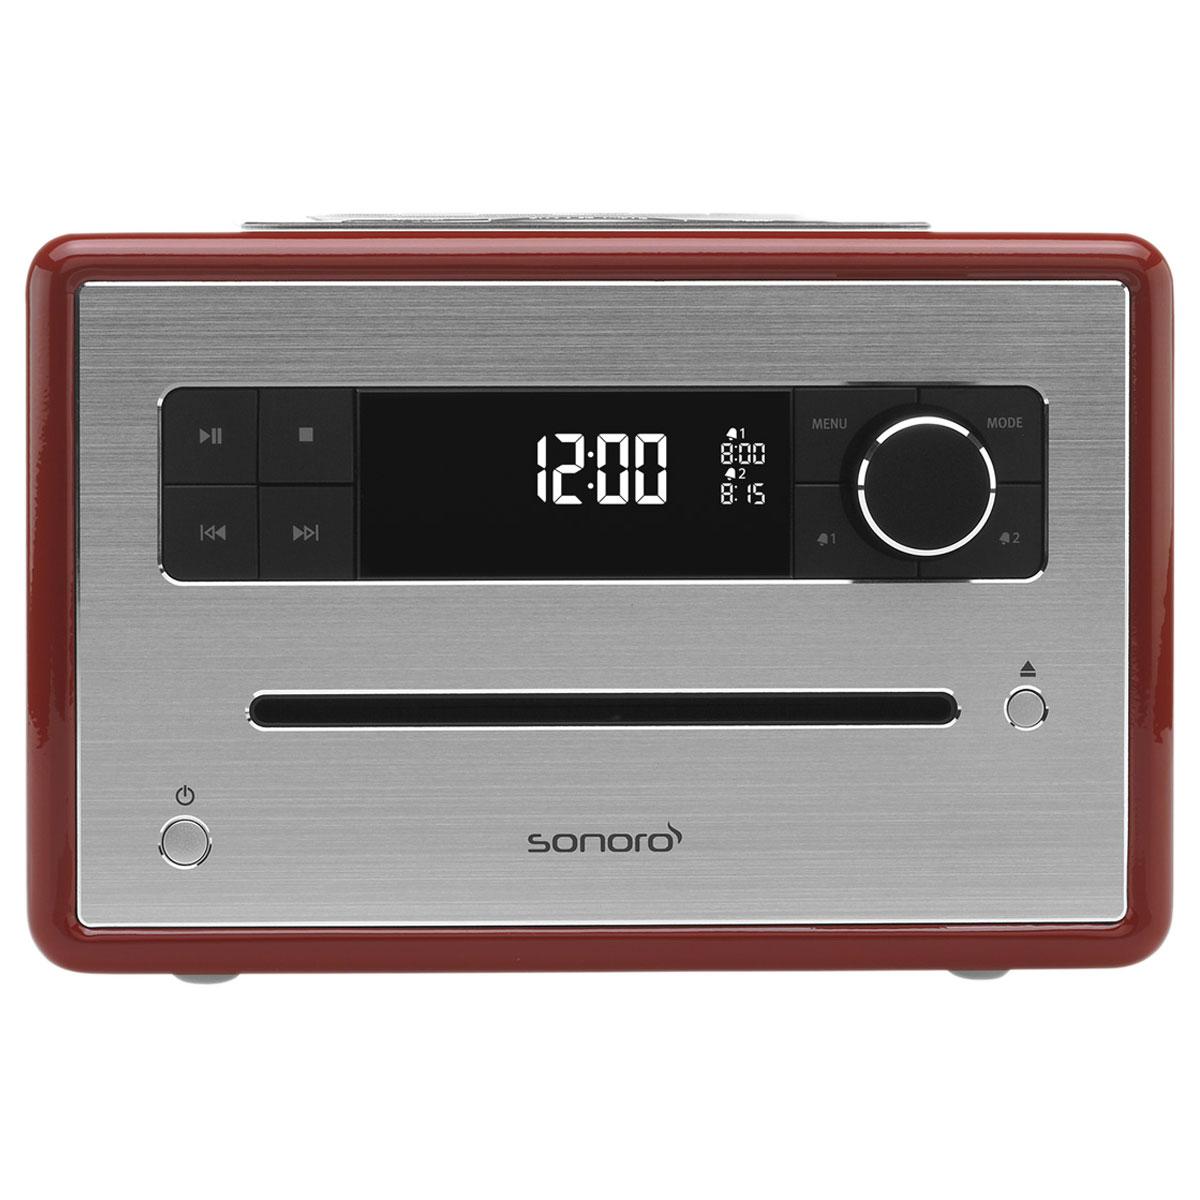 sonoro cd rouge radio radio r veil sonoro sur ldlc. Black Bedroom Furniture Sets. Home Design Ideas